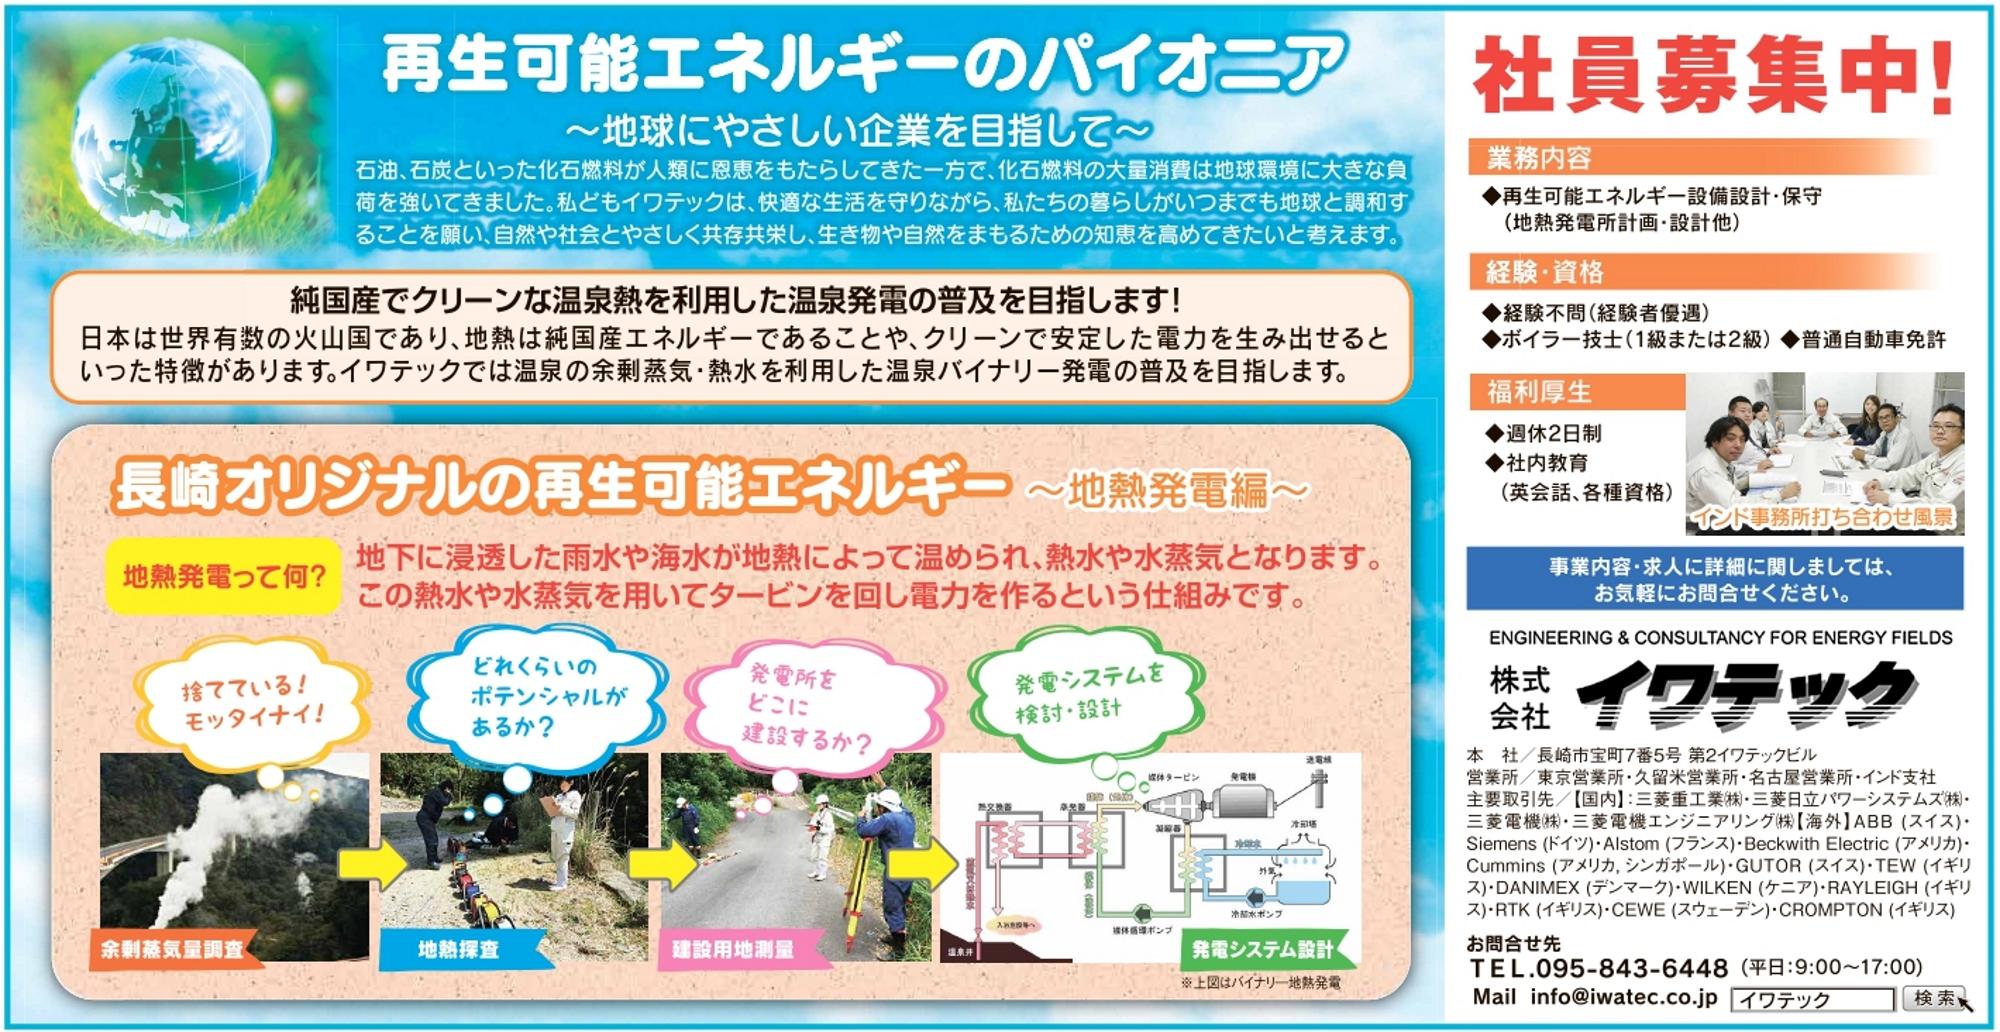 第2弾 長崎新聞のNR(Nagasaki Reader)10月号広告掲載!